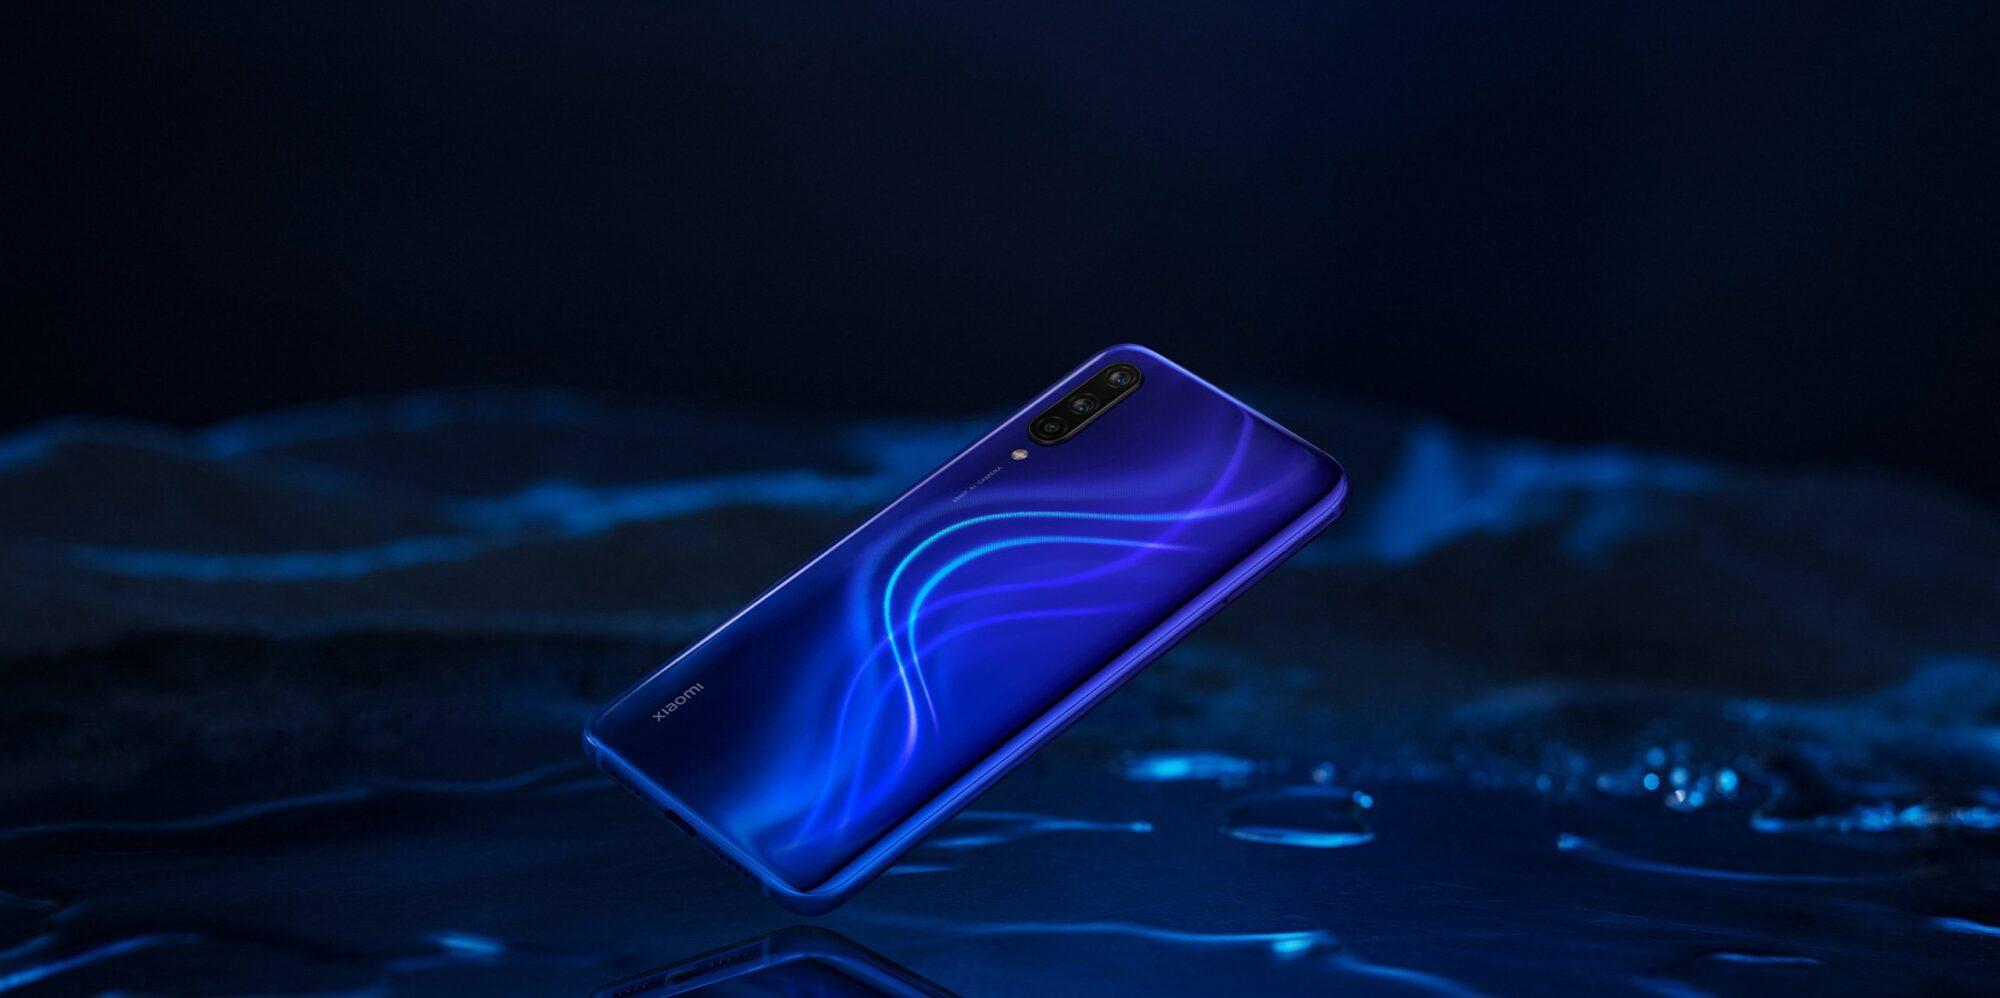 Xiaomi téléphone smartphone NFC IR 48 MP Photo empreintes écran encoche dos verre Mi 9 Lite Mi 9T Pro Snapdragon 710